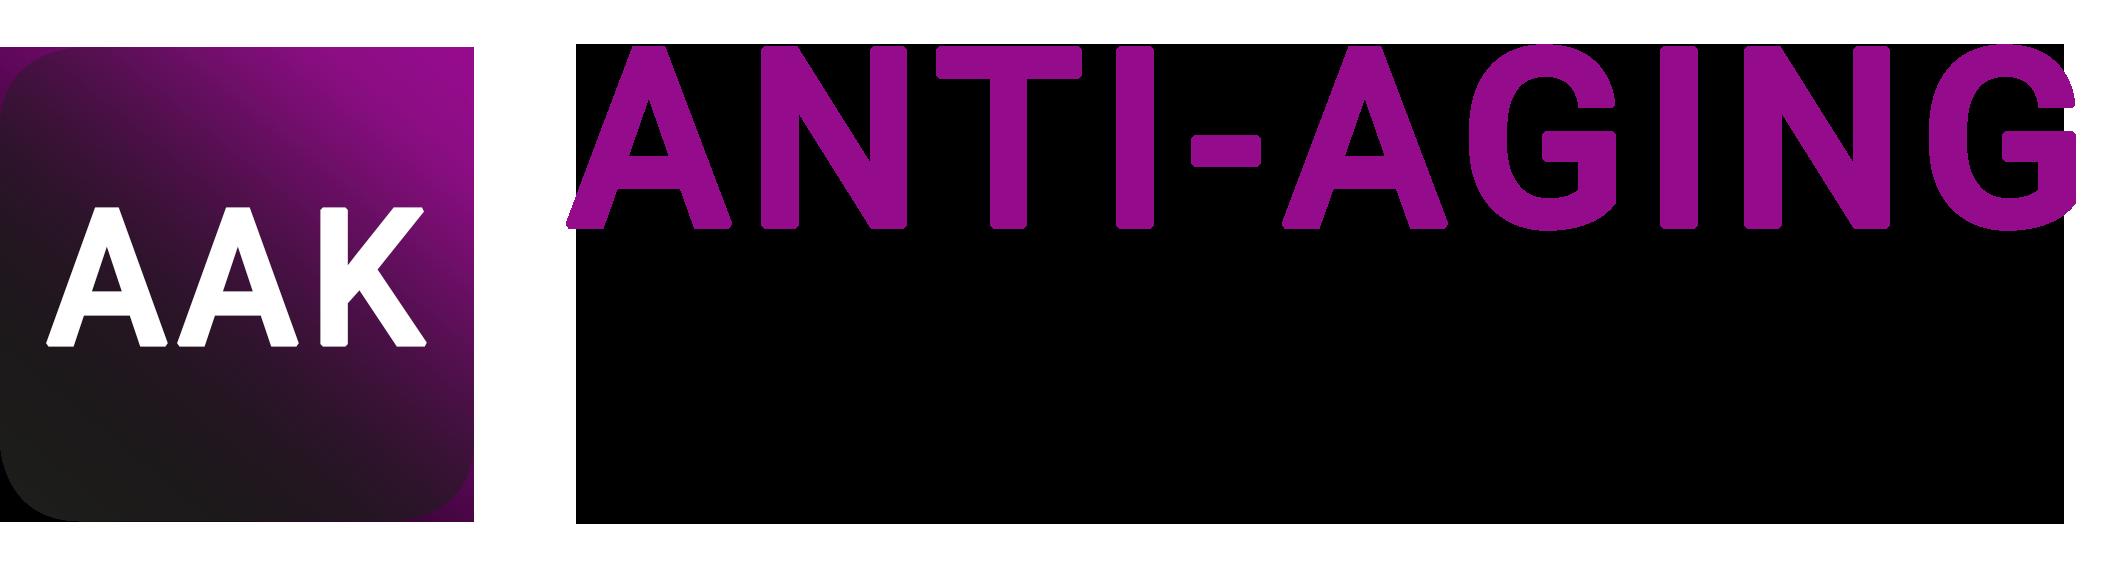 aa logo (1)